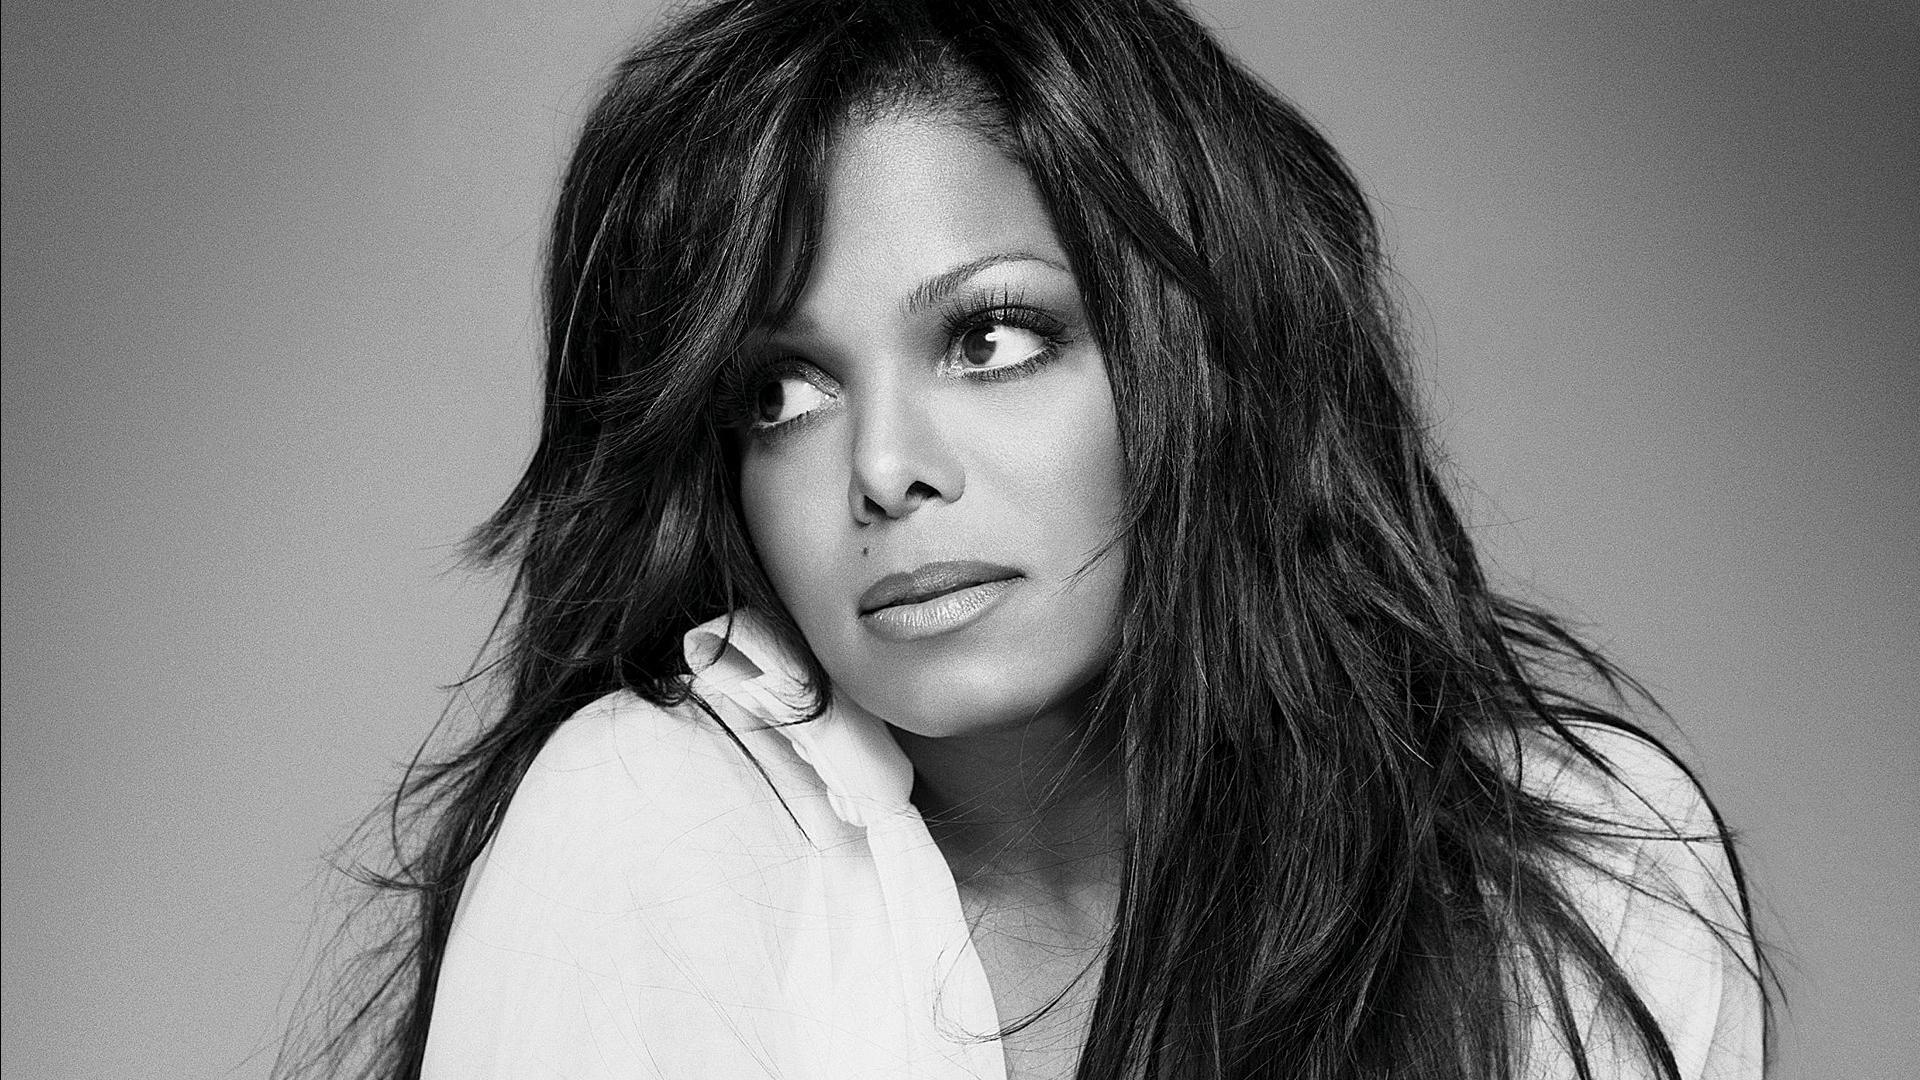 Janet Jackson – Take Me Away